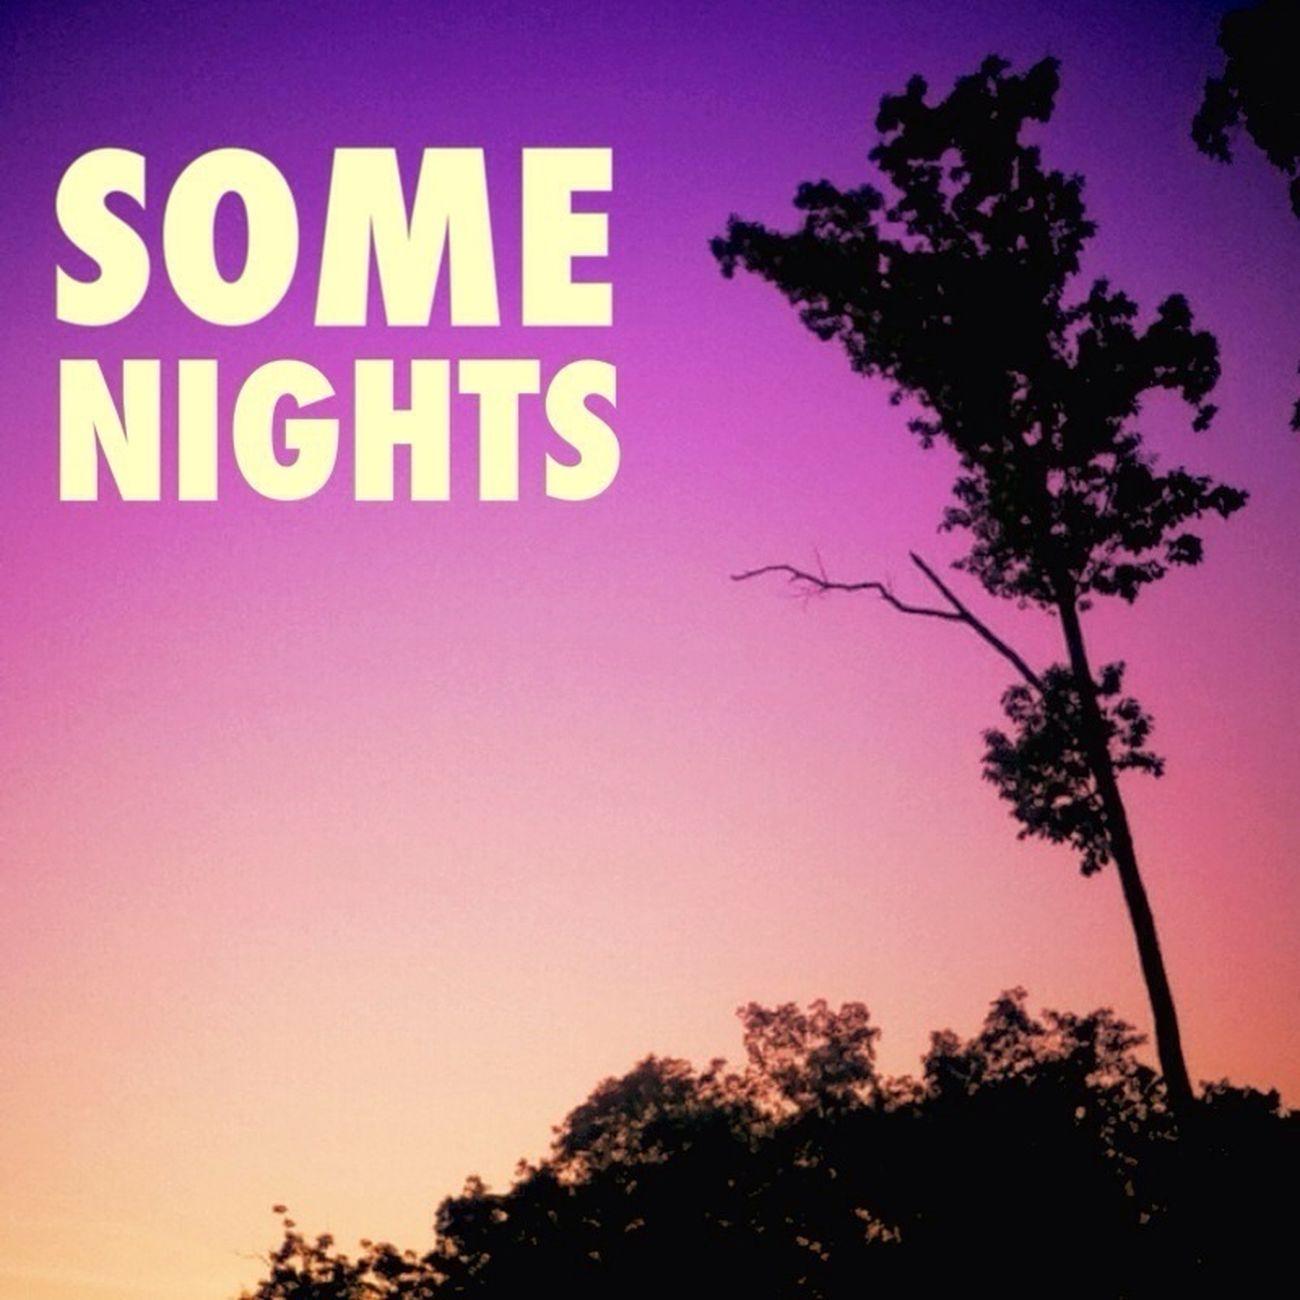 Sunset Purple Some Nights